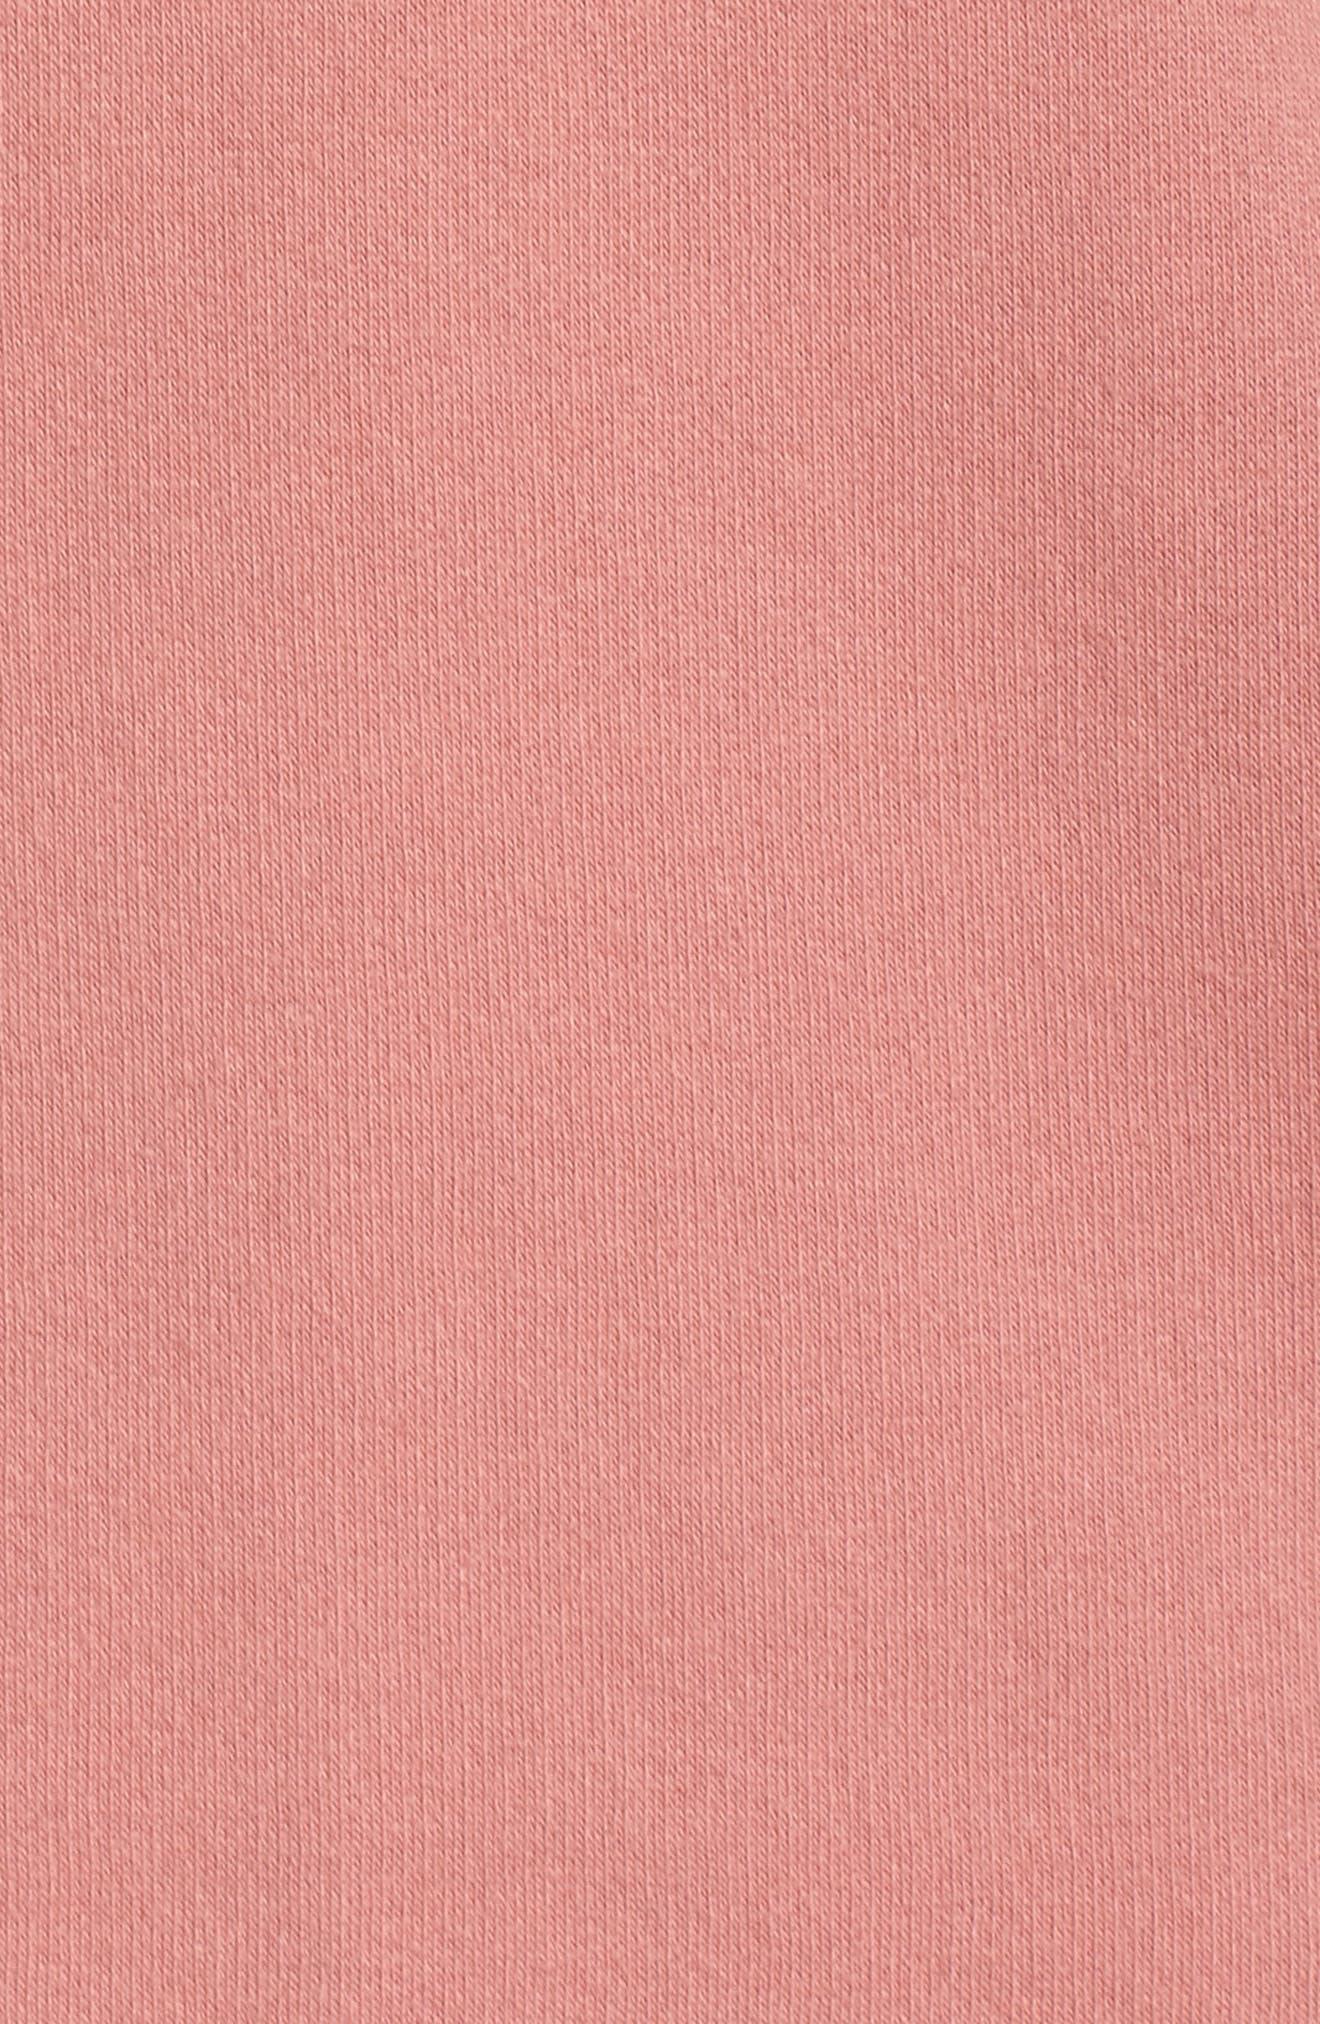 Brunette Crewneck Sweatshirt,                             Alternate thumbnail 6, color,                             Dusty Rose